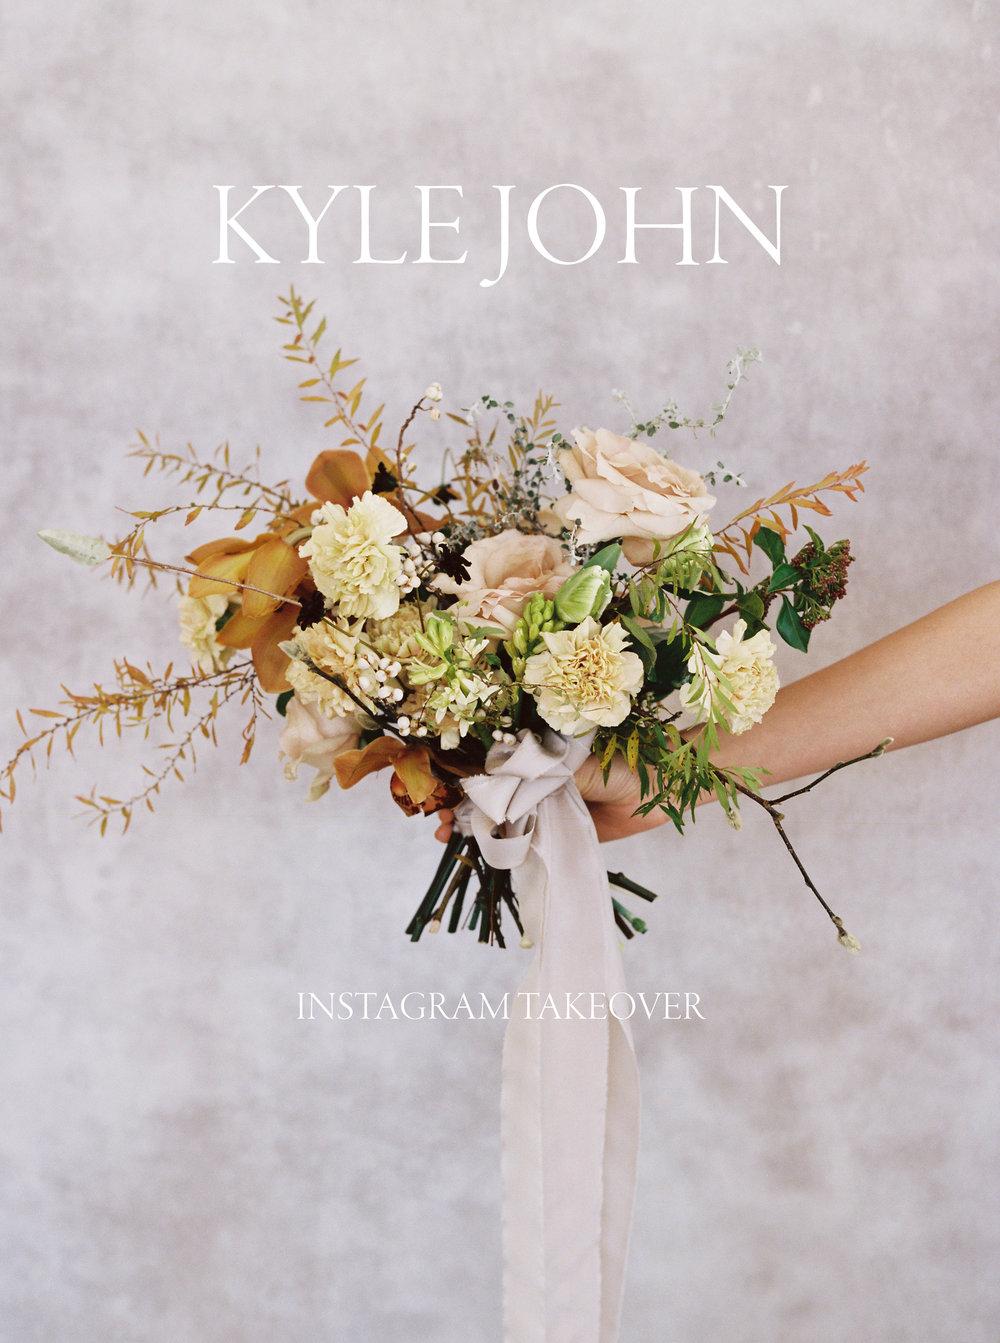 kyle_john_pvtakeover_photovisionprints.jpg